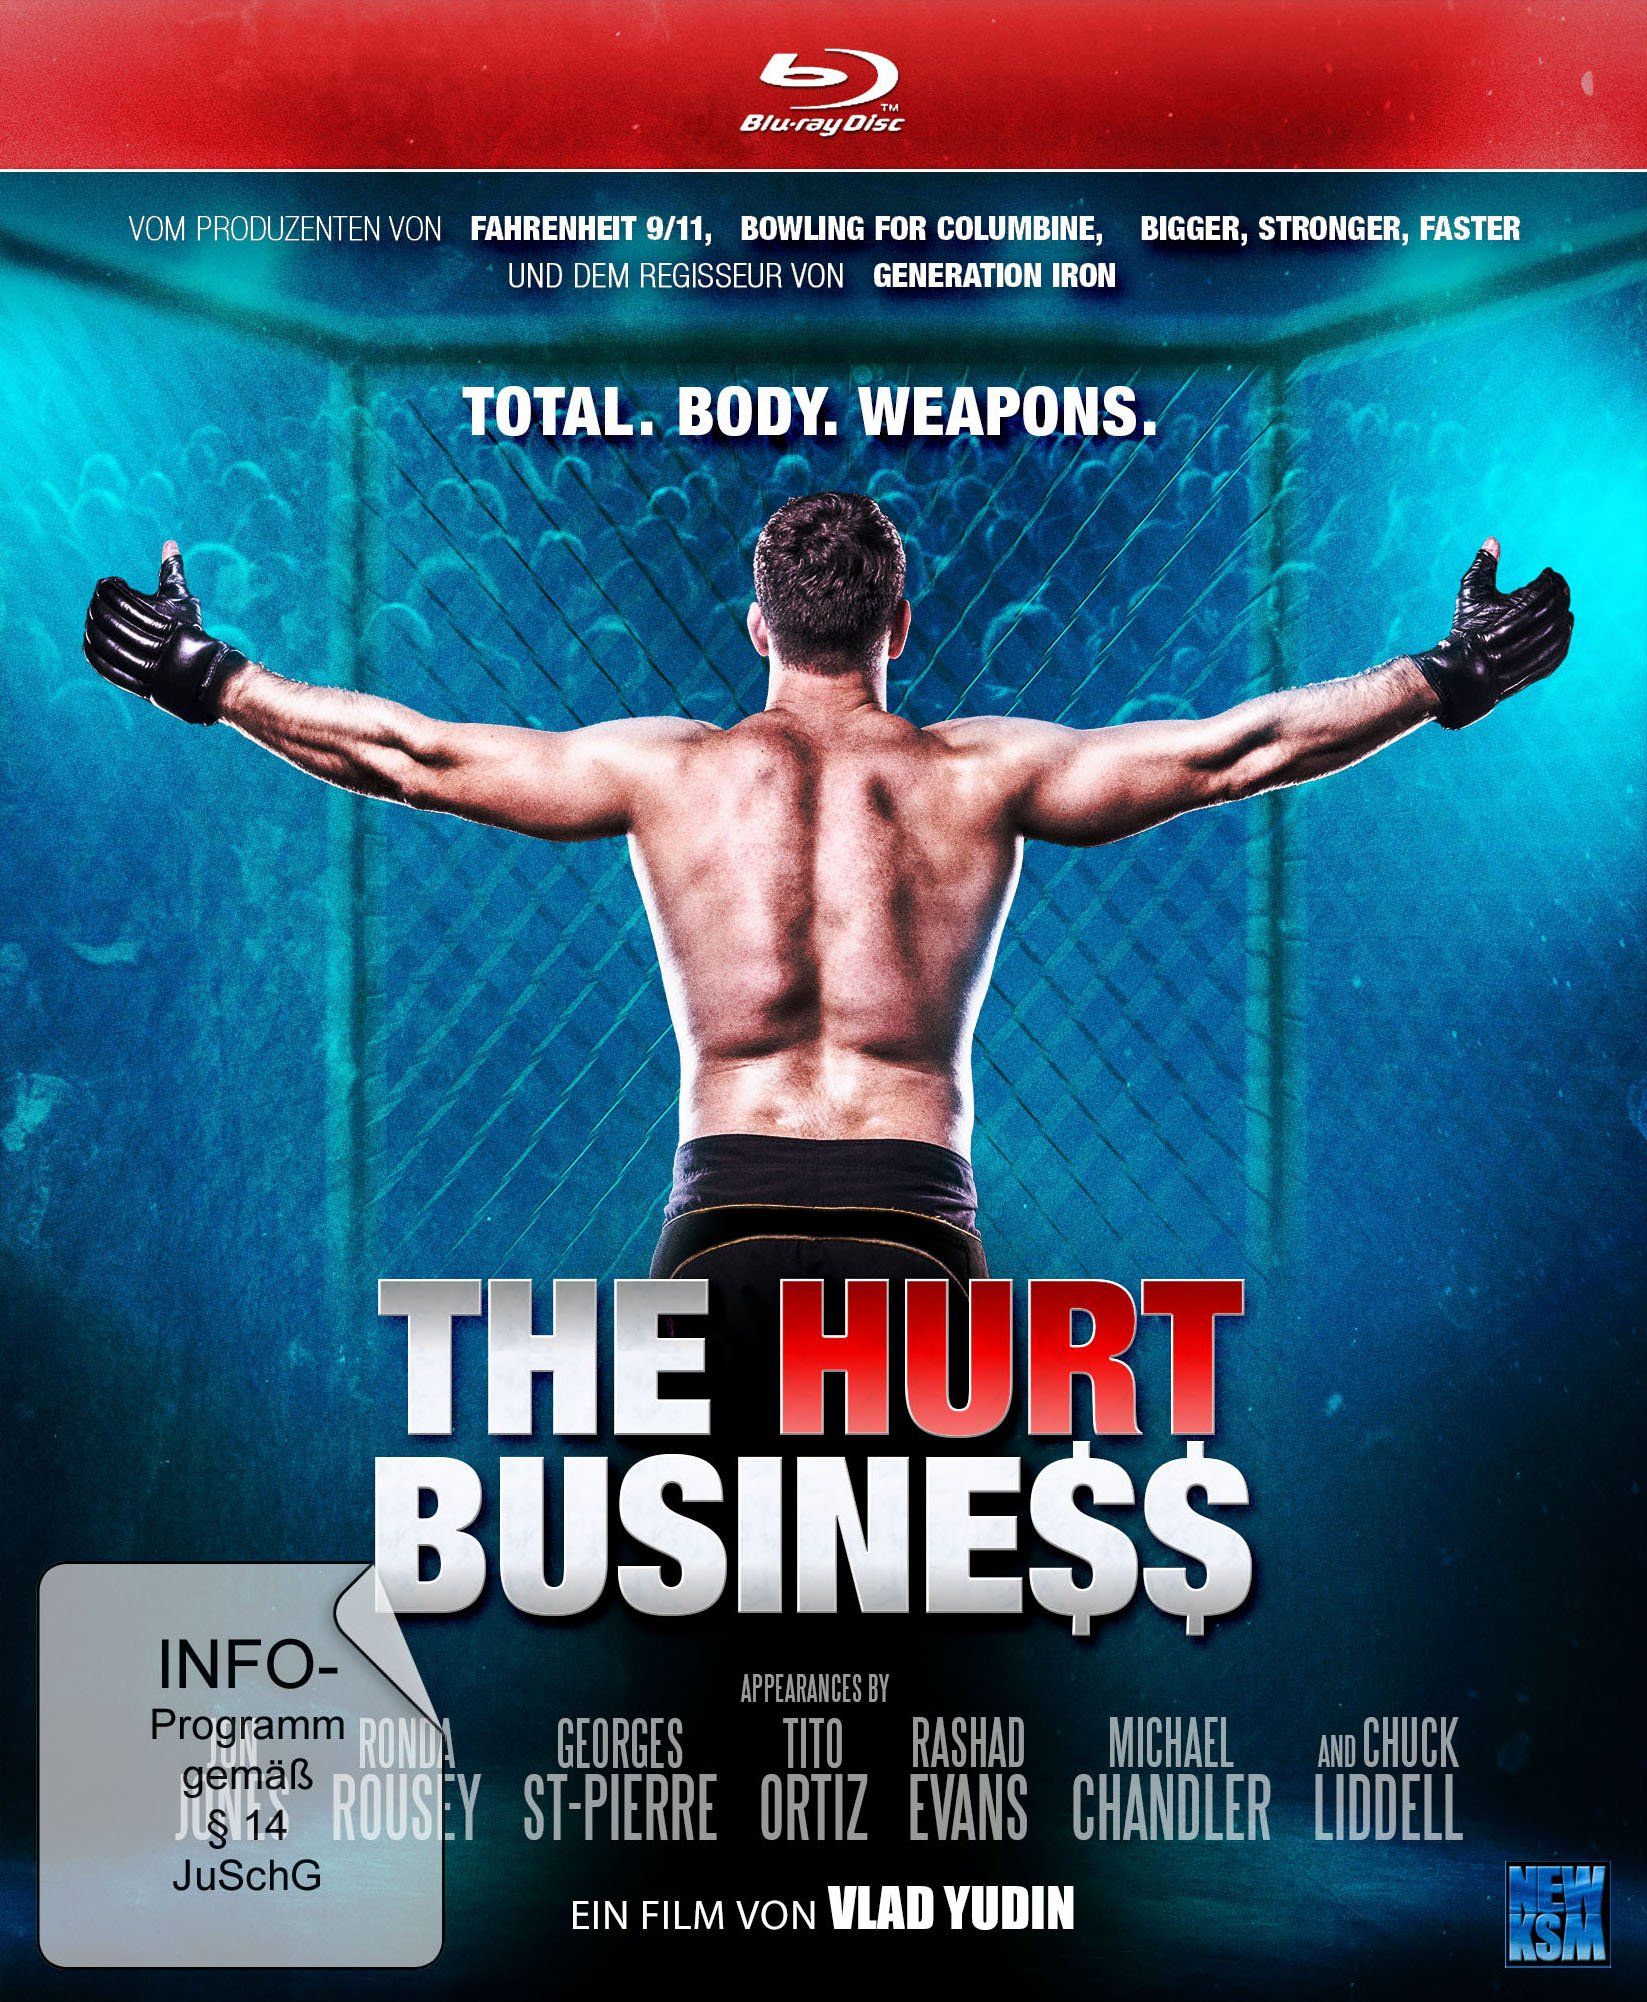 The Hurt Business 2016 German dl Doku BluRay x264 MiLW